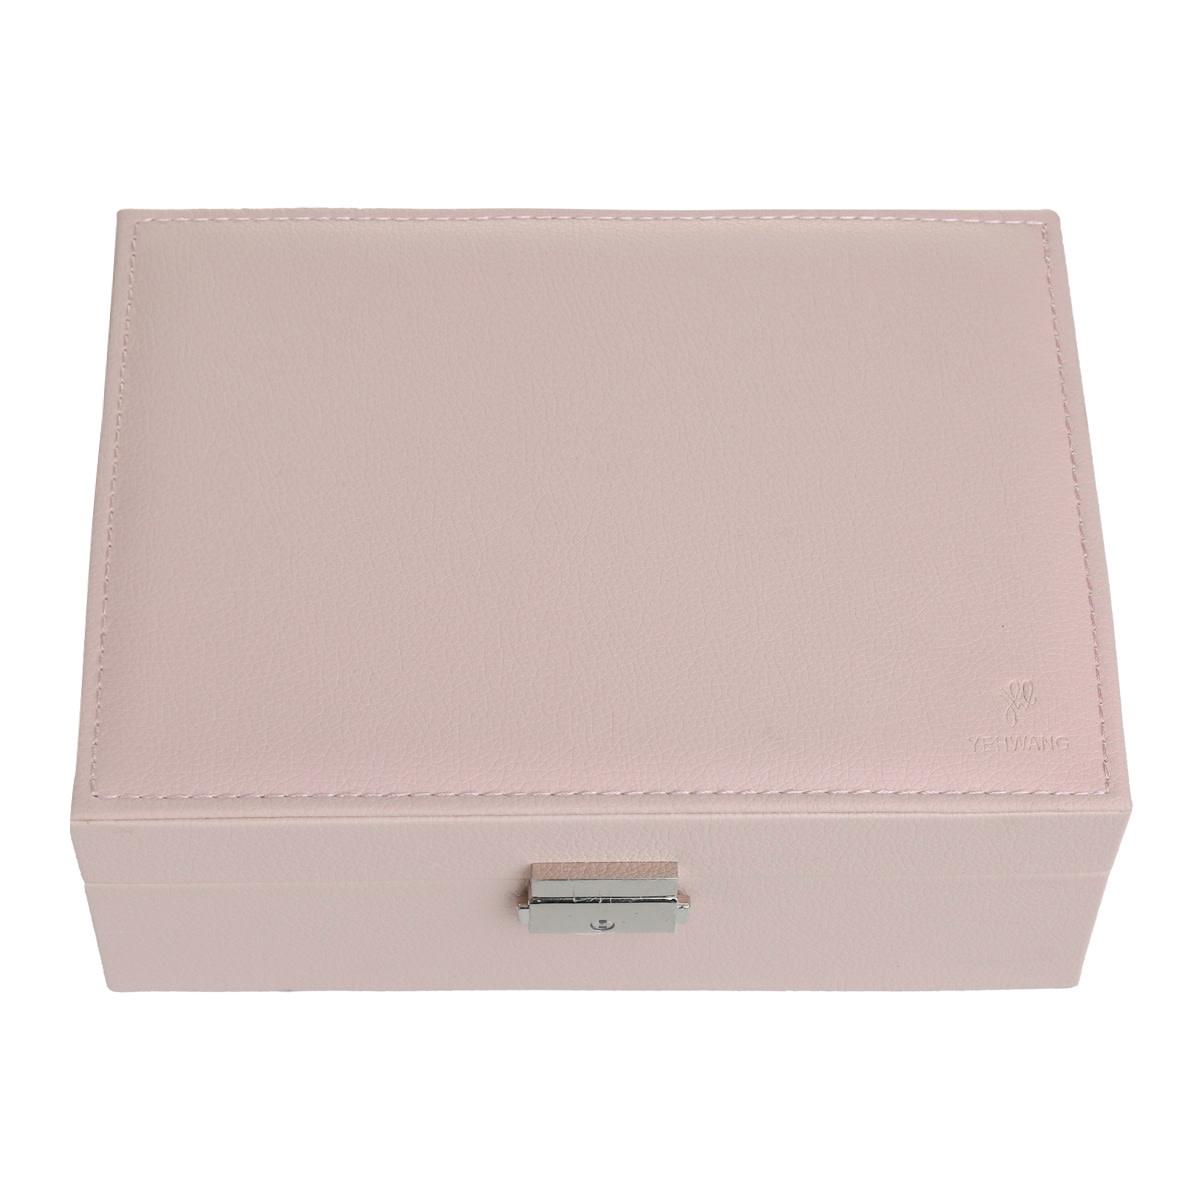 With love Jewellery box pink 23 x 17 cm